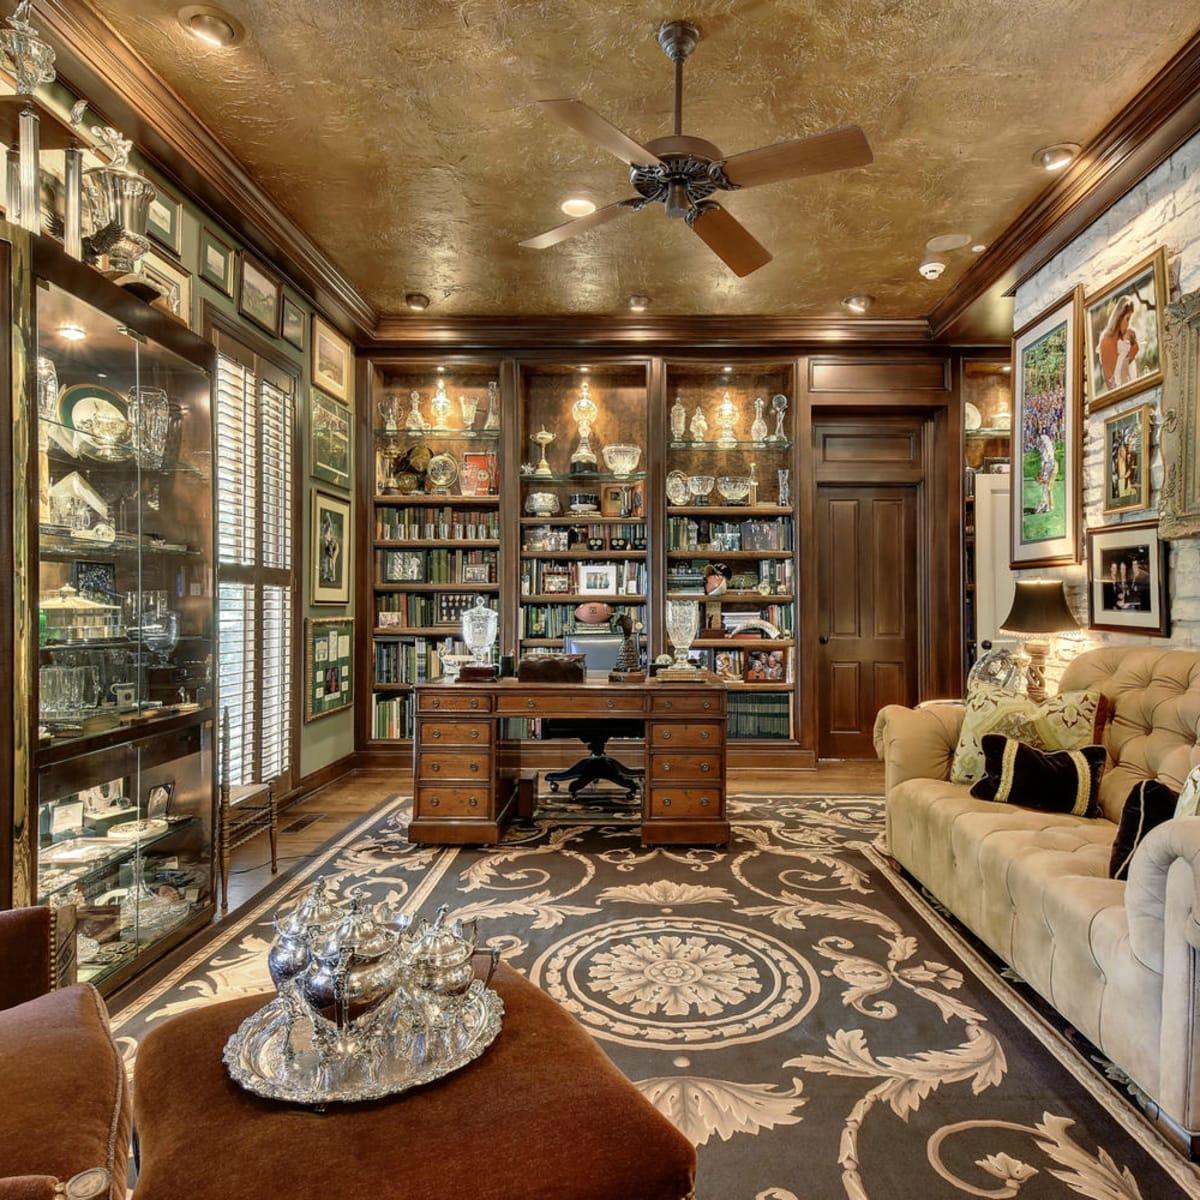 Austin house home Tarrytown 2610 Kenmore Court Ben Crenshaw February 2016 office